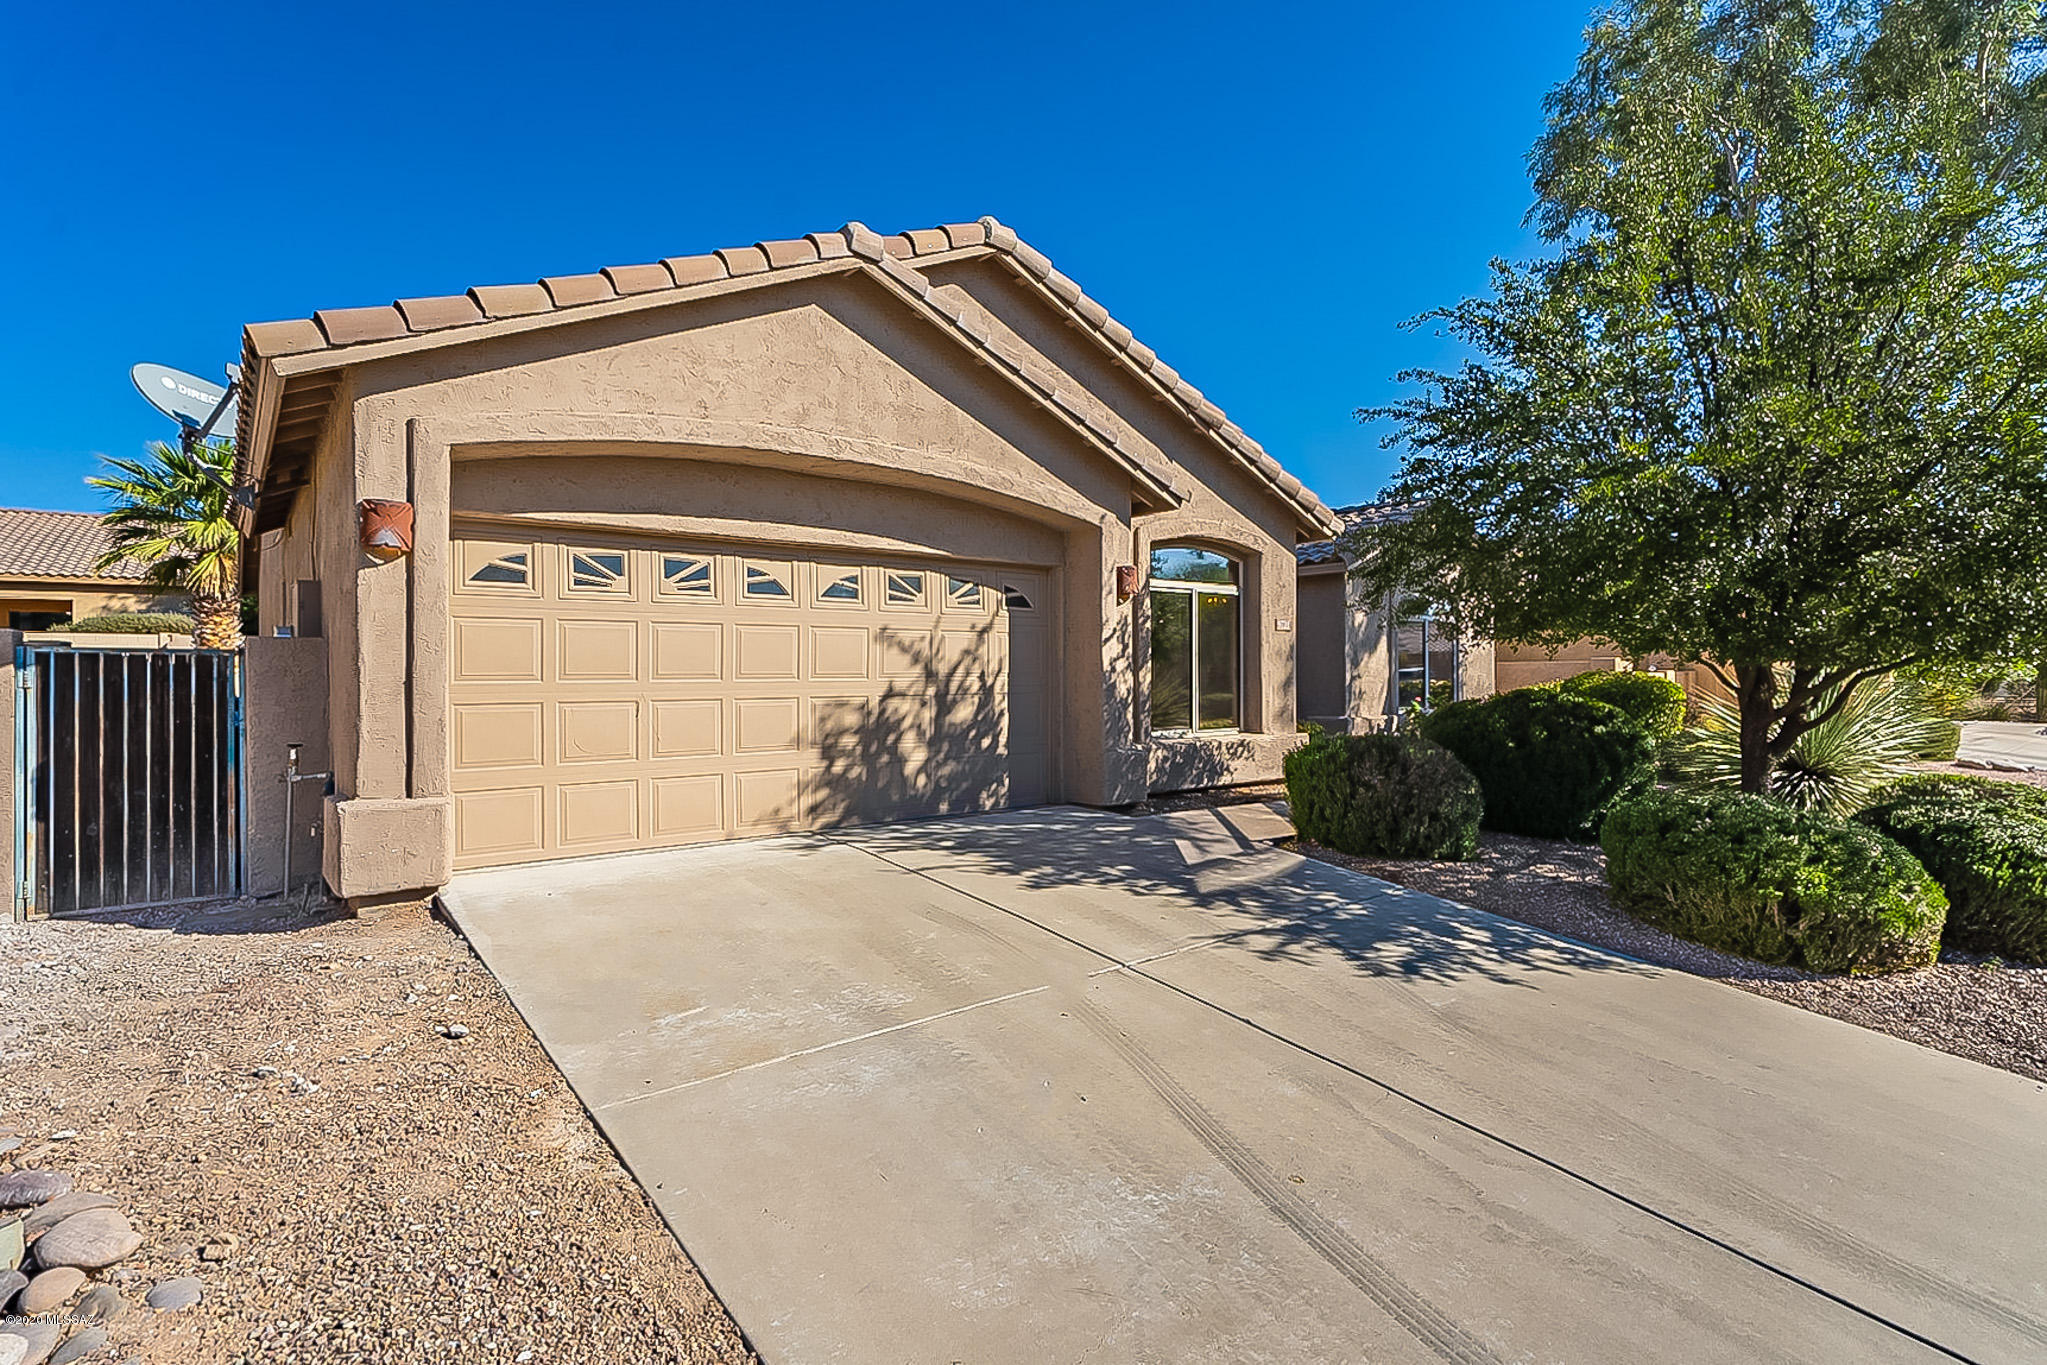 Photo of 9721 E Sandcastle Court, Tucson, AZ 85749